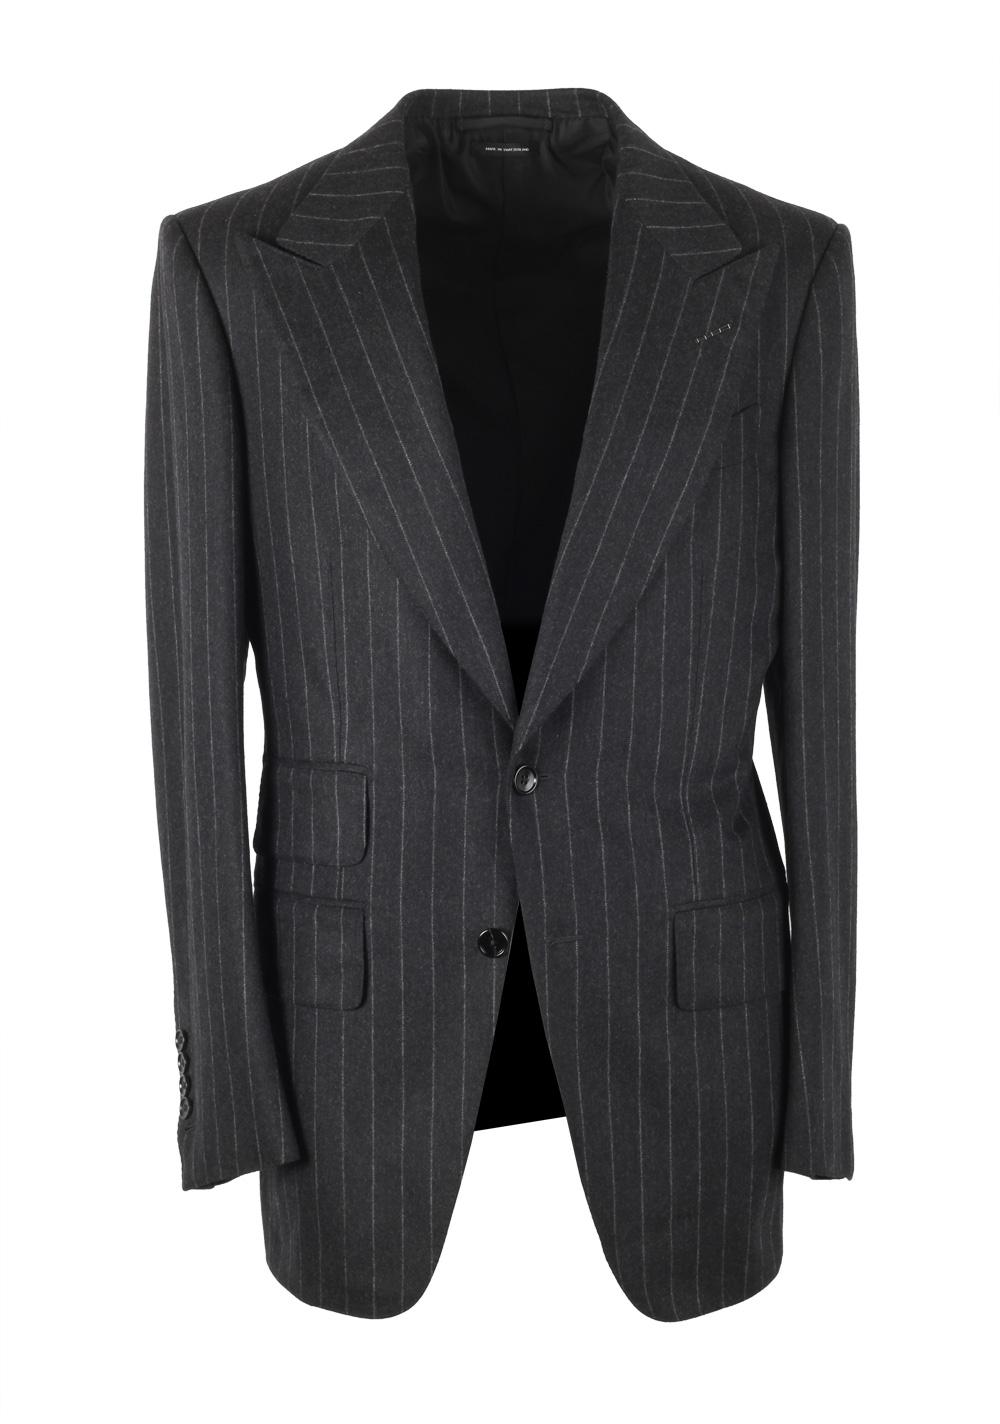 TOM FORD Atticus Gray Striped Flannel Suit Size 46 / 36R U.S. | Costume Limité